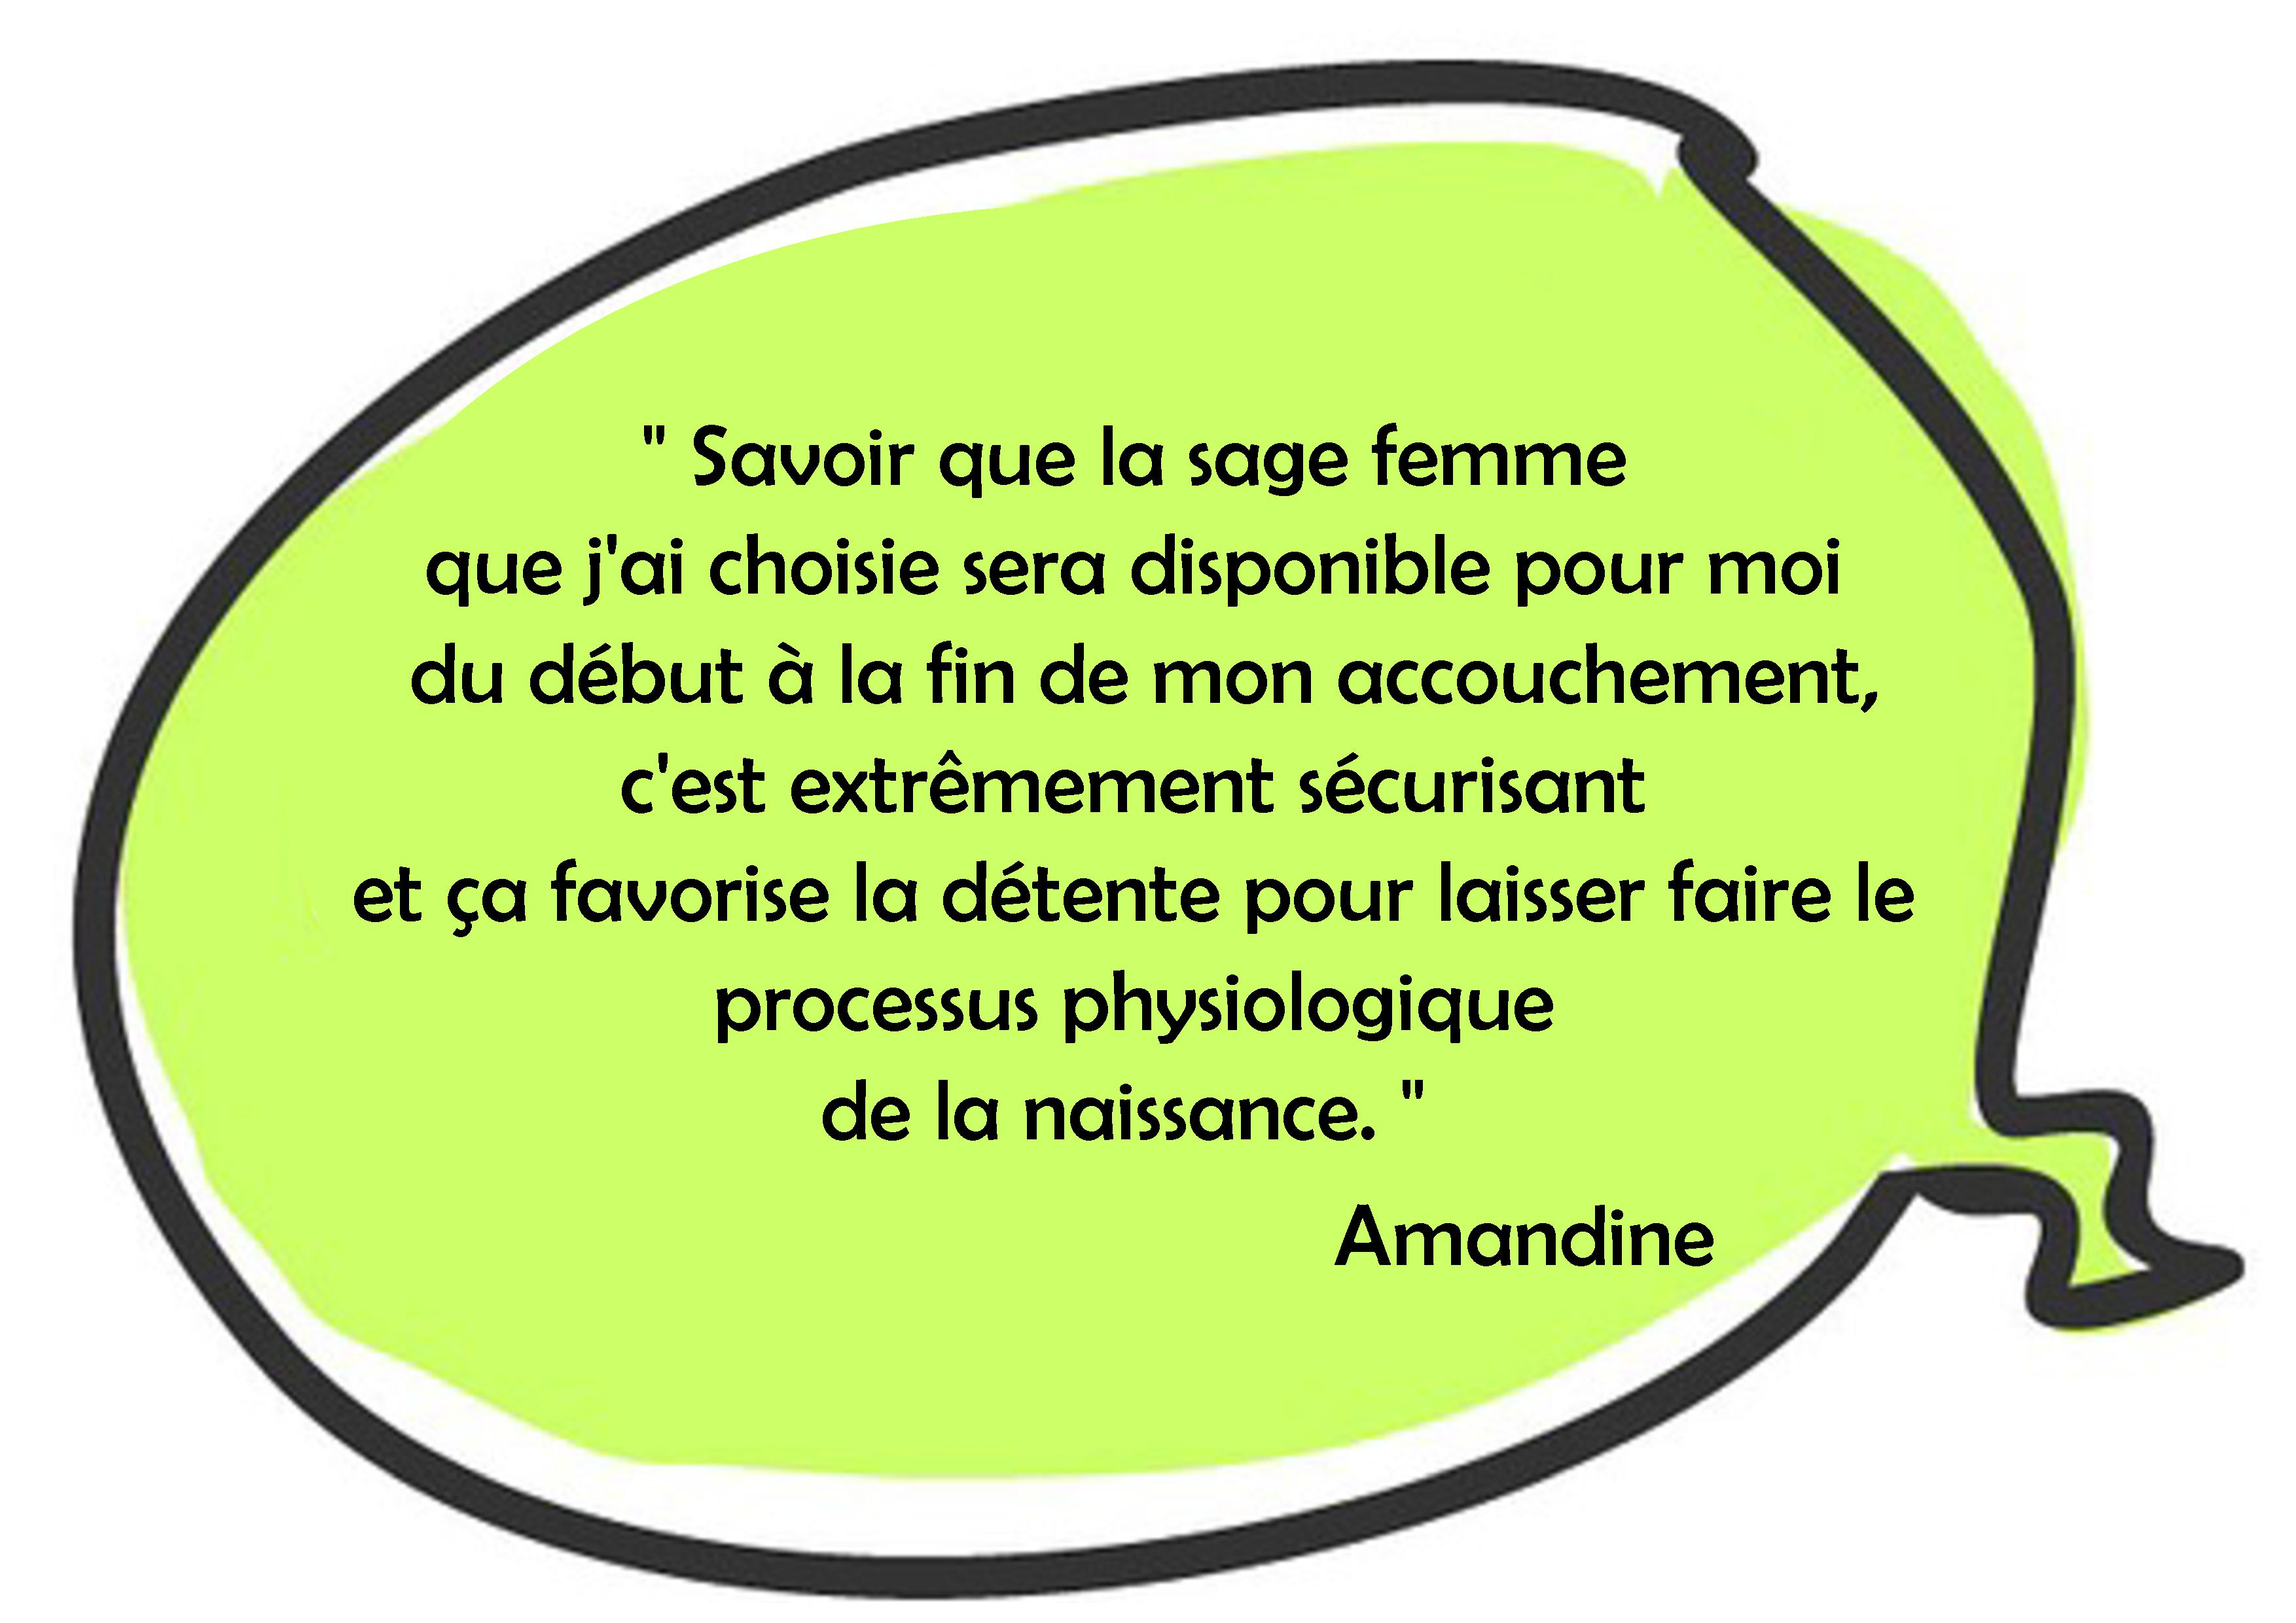 image Amandine.jpg (0.5MB)